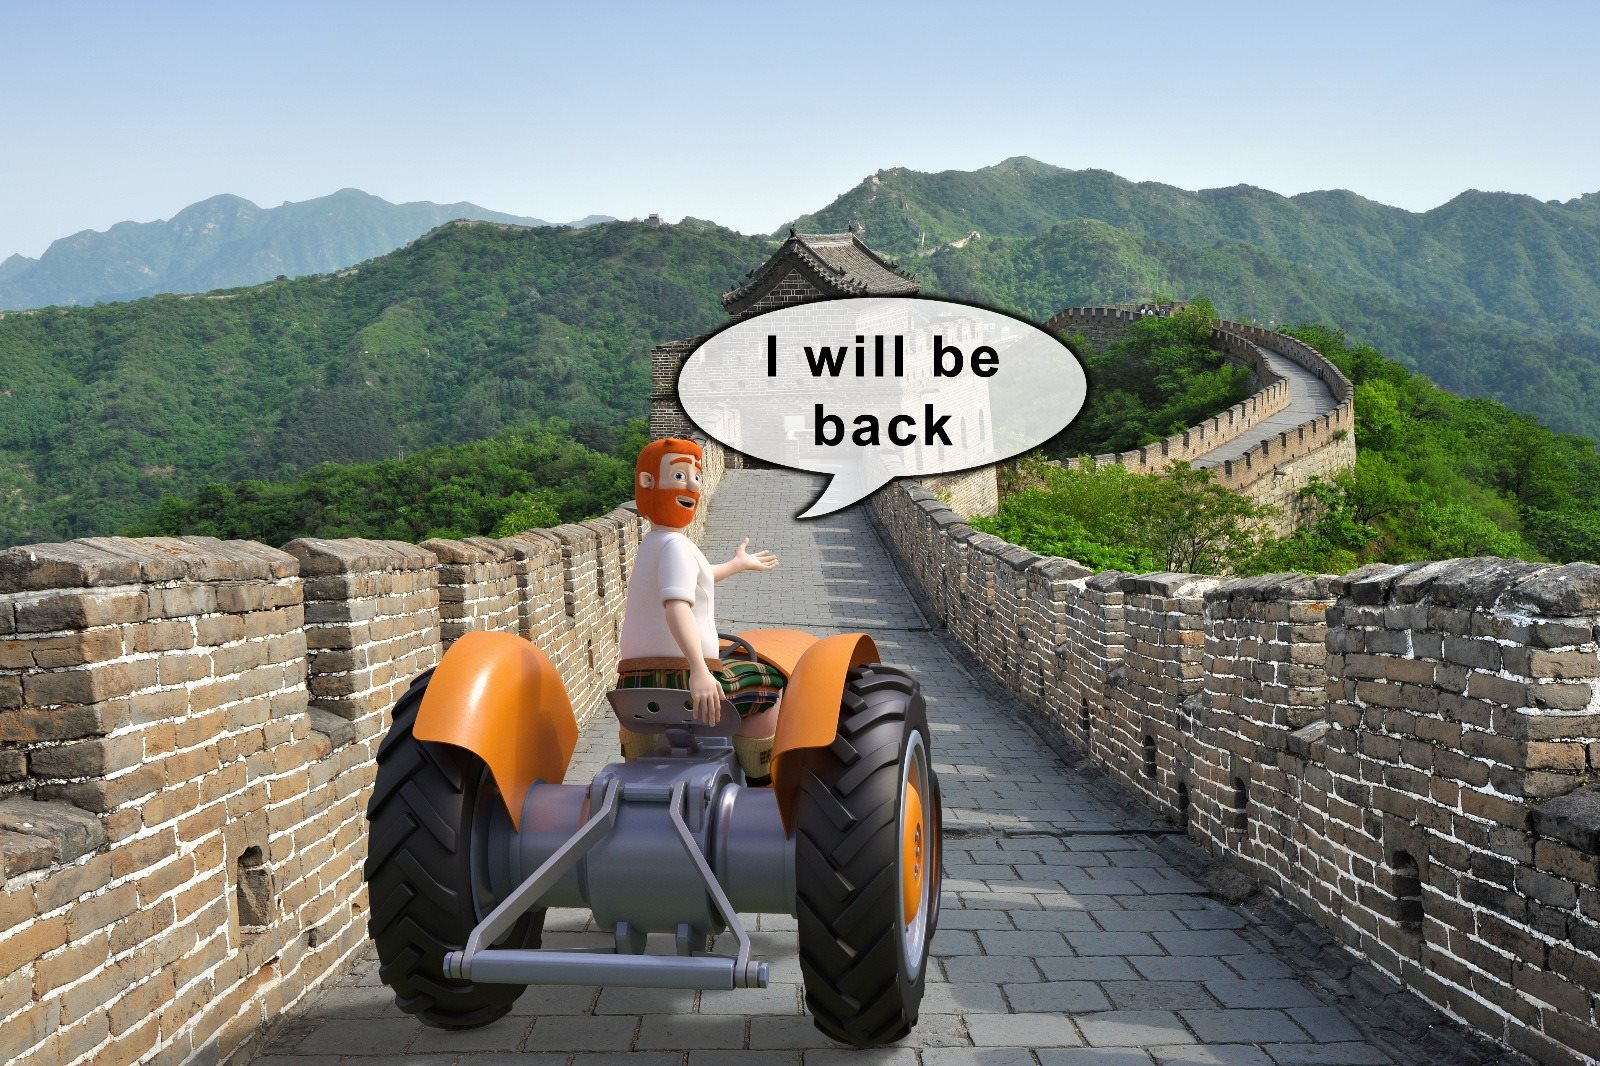 Donald on his China adventure